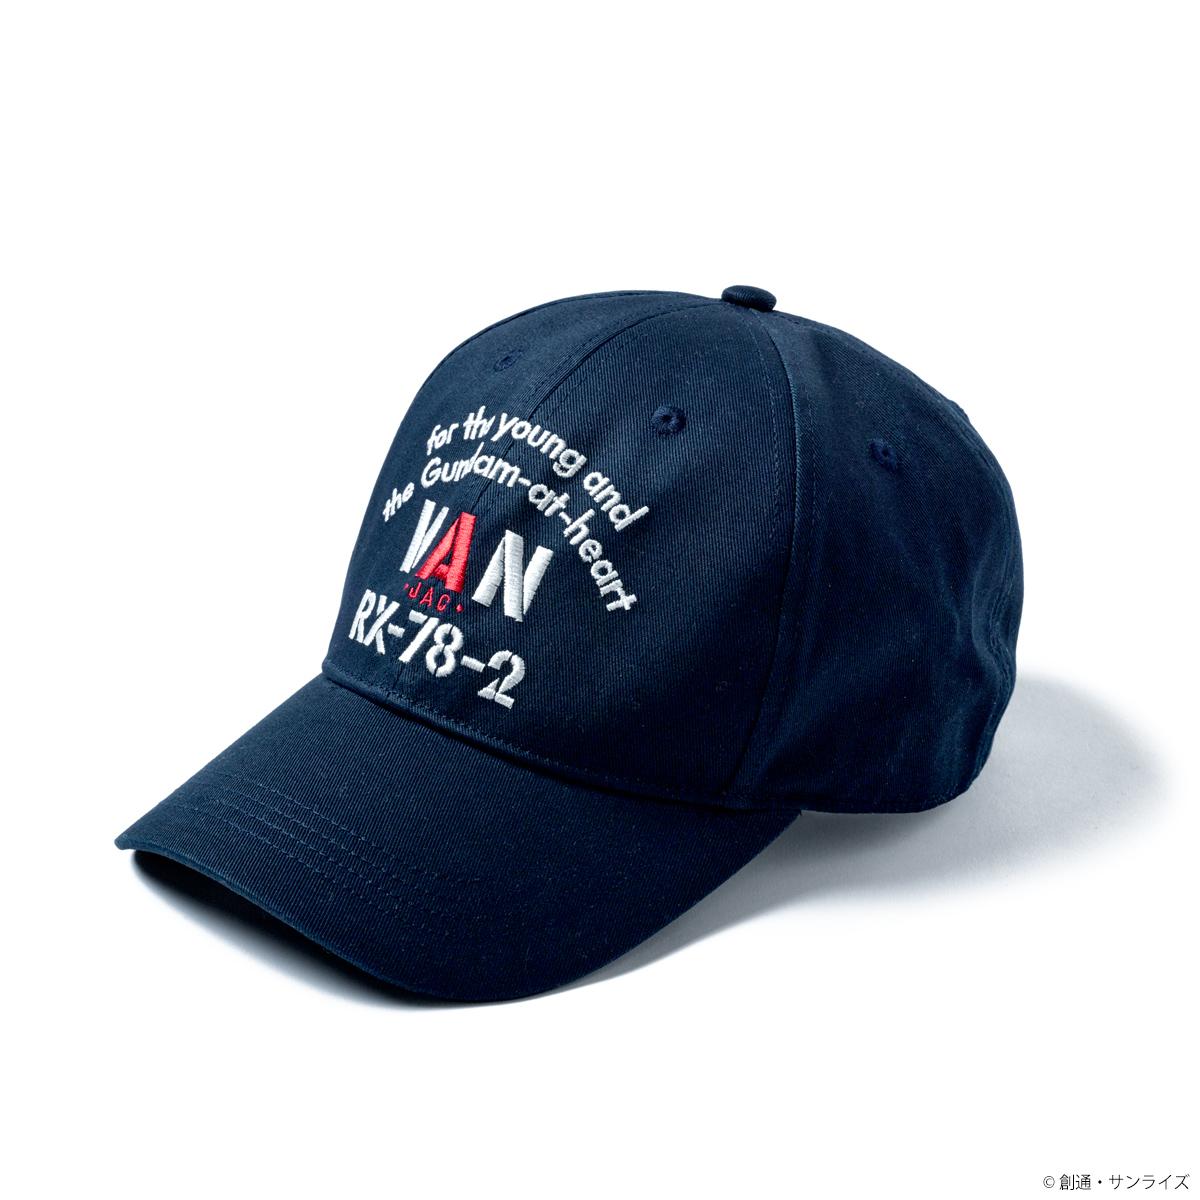 STRICT-G × VAN『機動戦士ガンダム』ベースボールcap